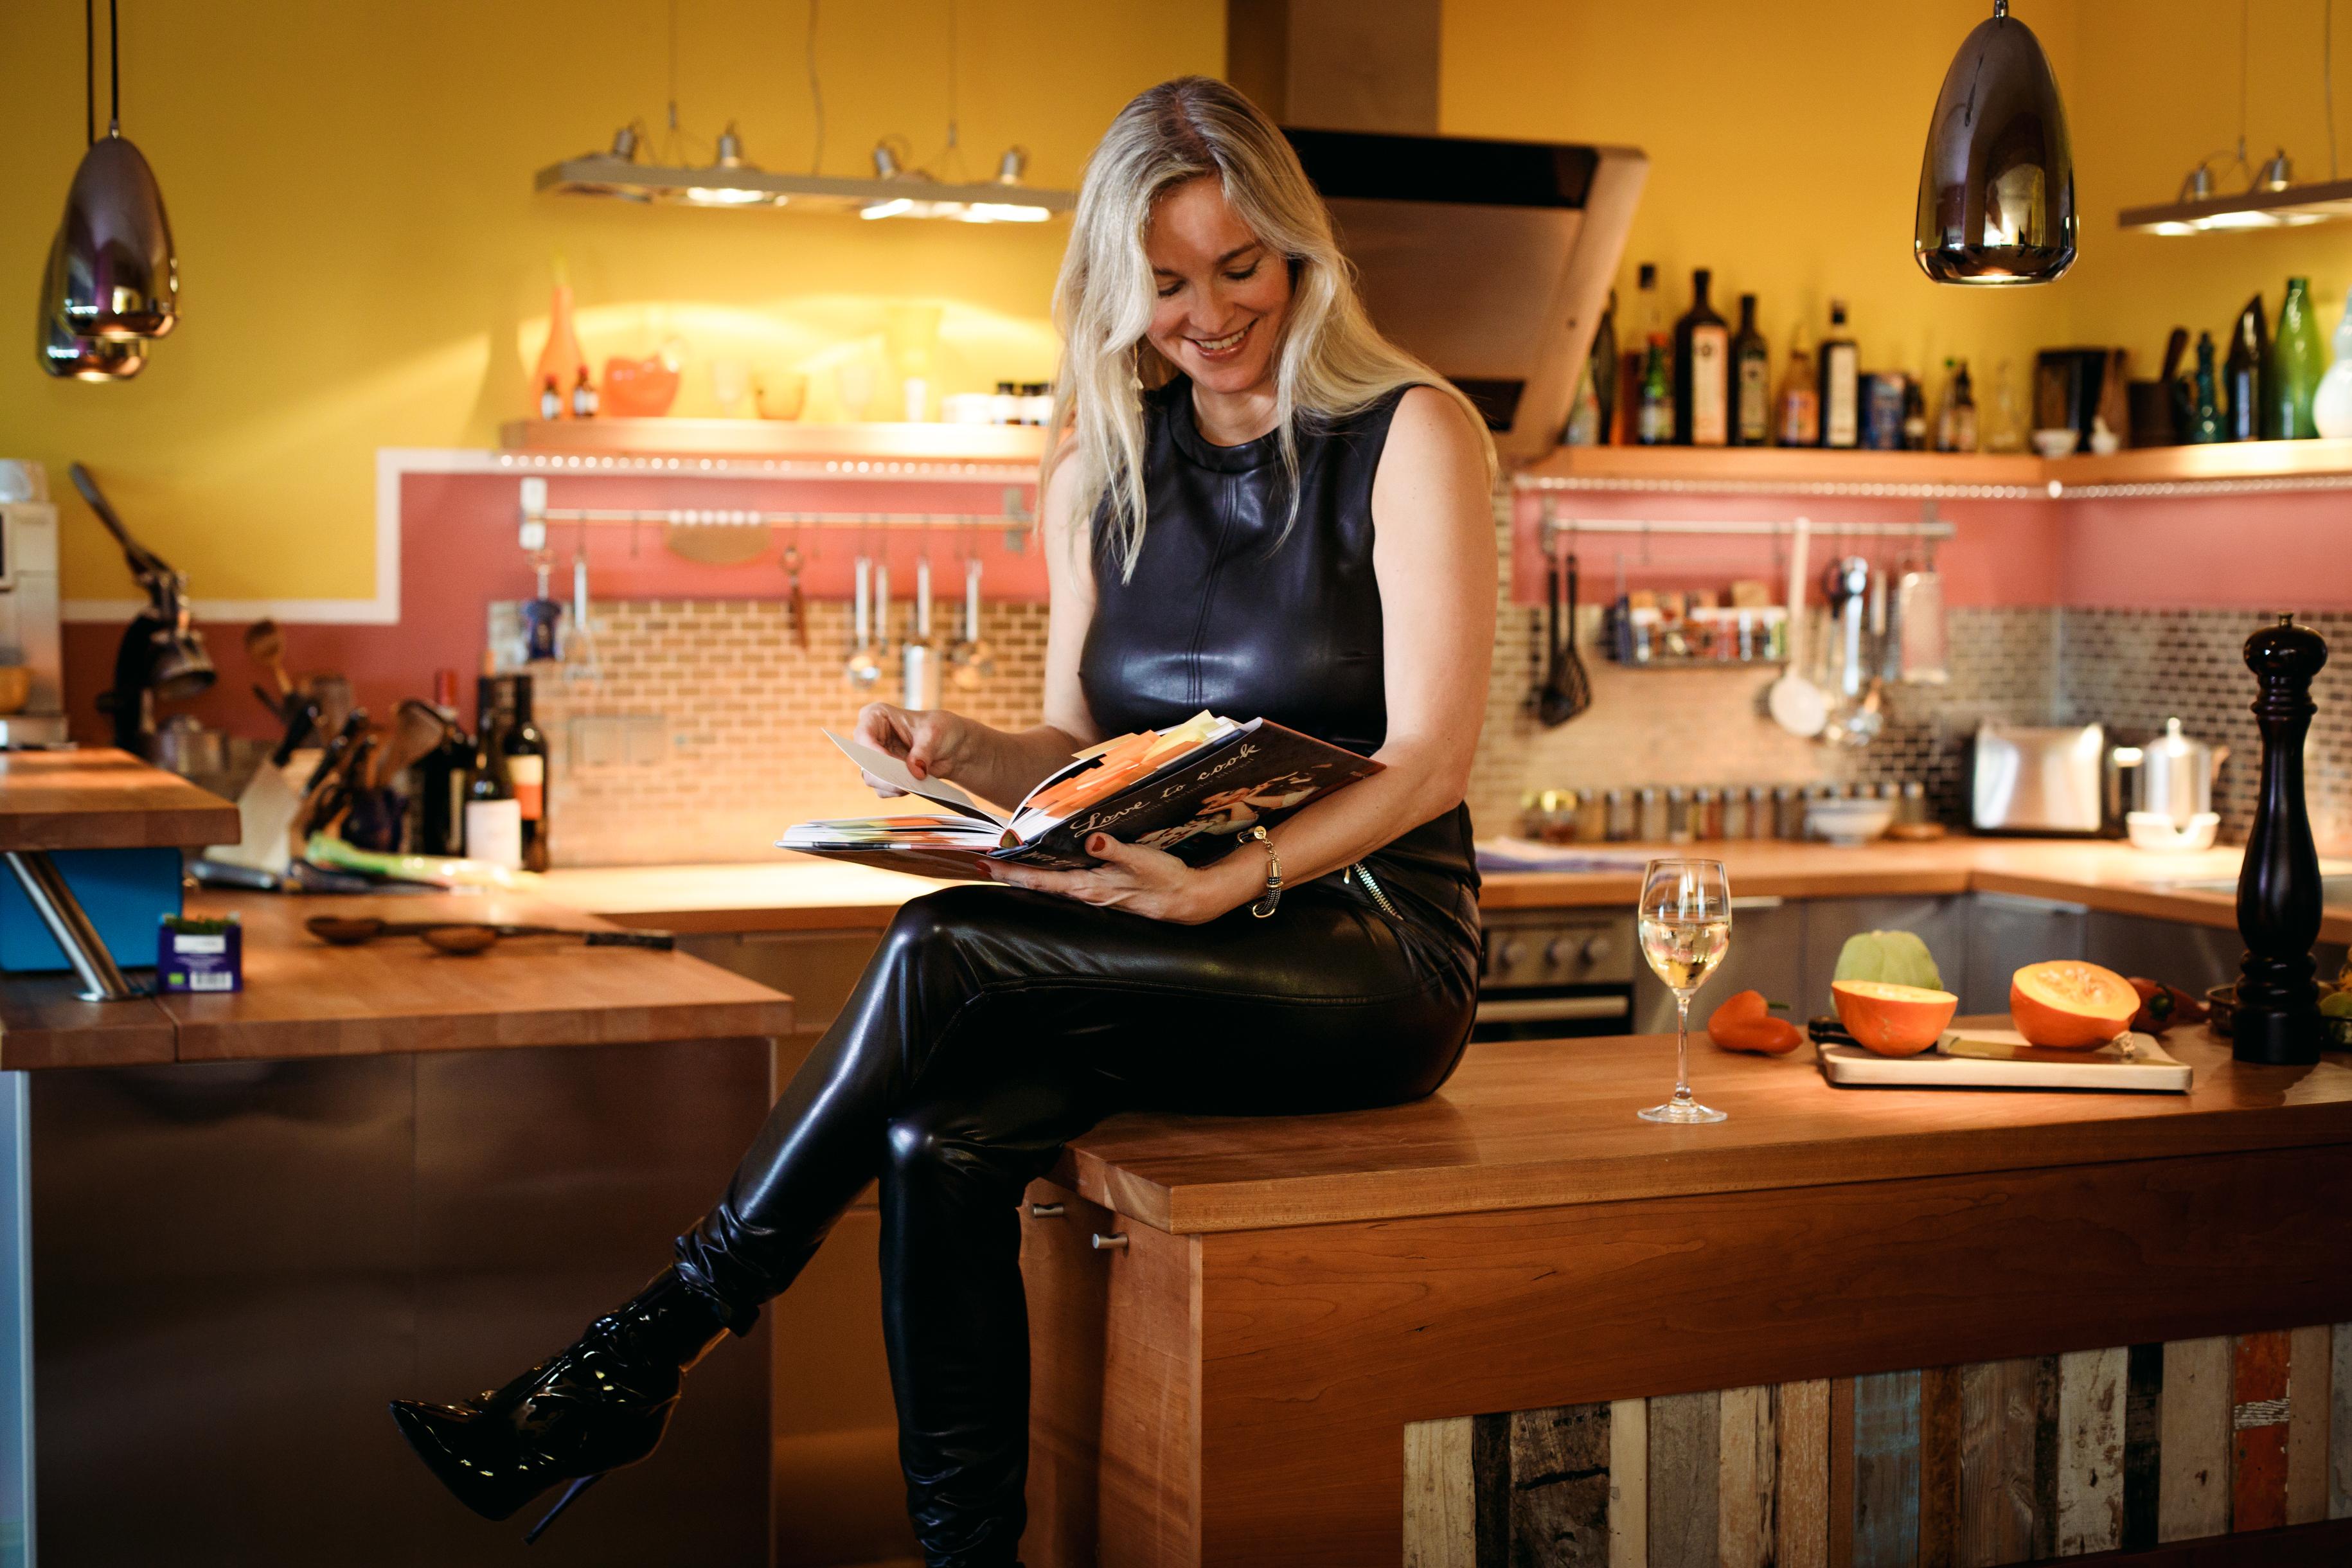 Christina-arcanum-vegane-lederhose-shine-in-kueche-cook-in-leather